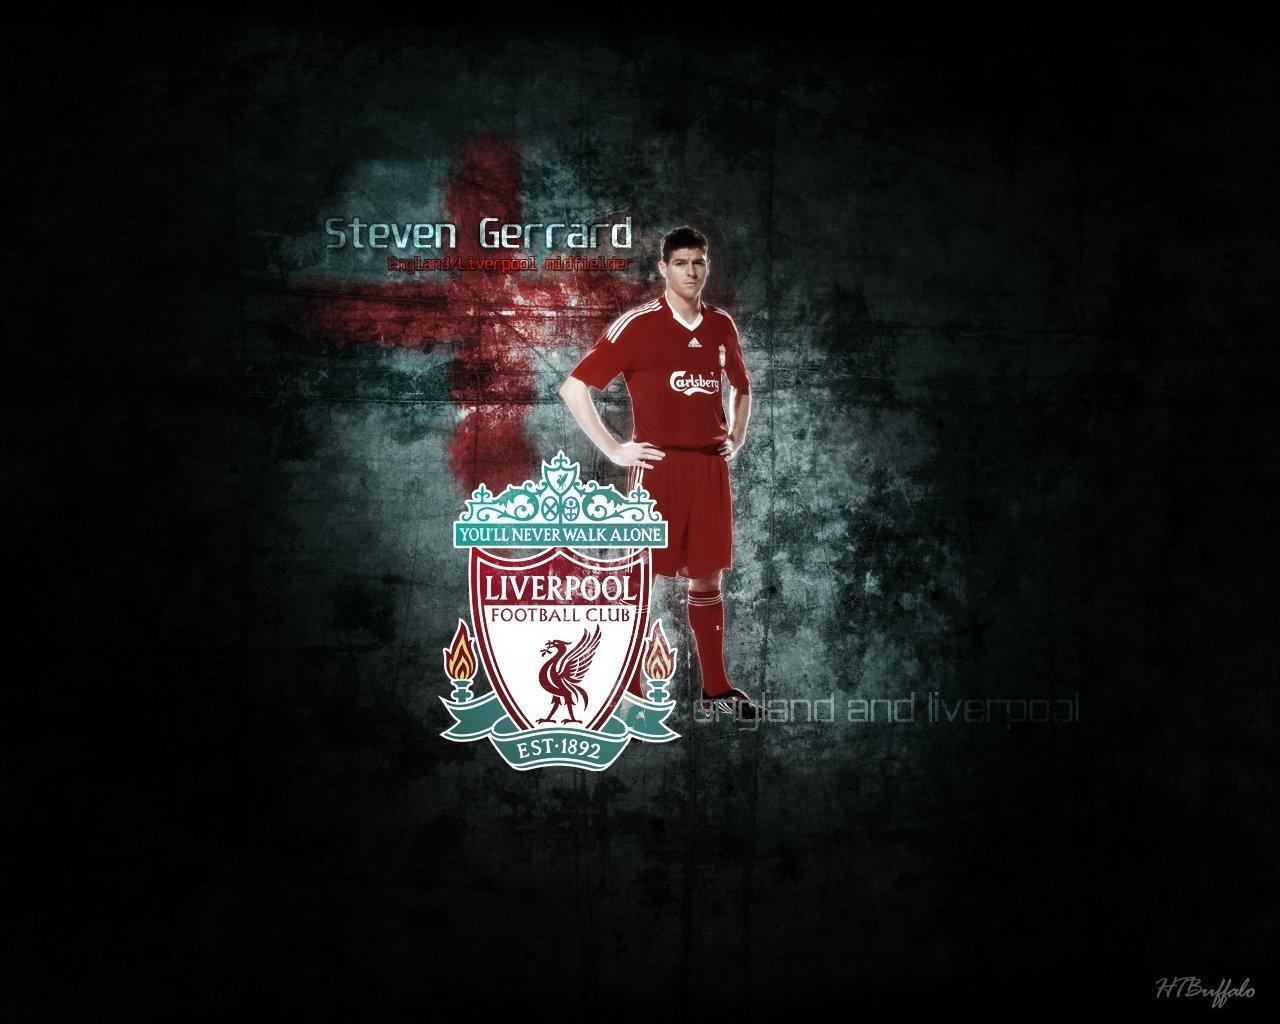 Liverpool Fotball Club Logo wallpaper 1280x1024